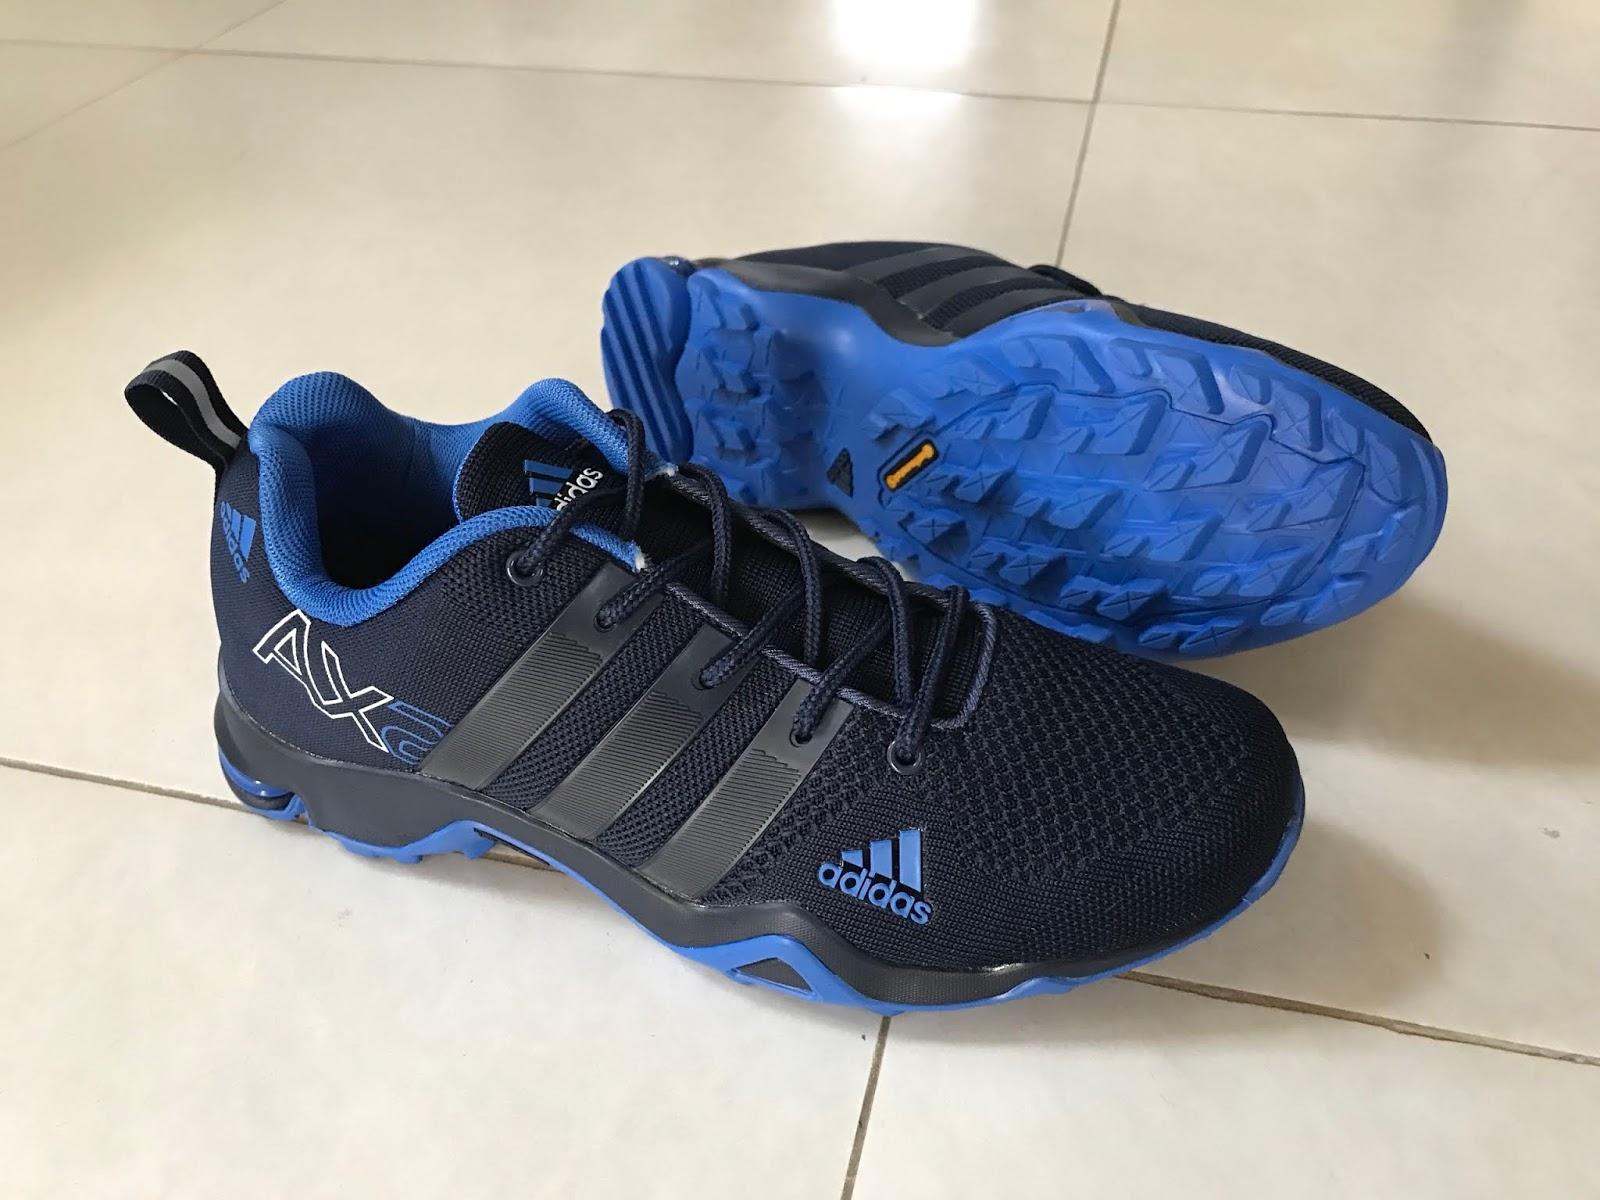 Giày Adidas Nam AX2 SF Size 40